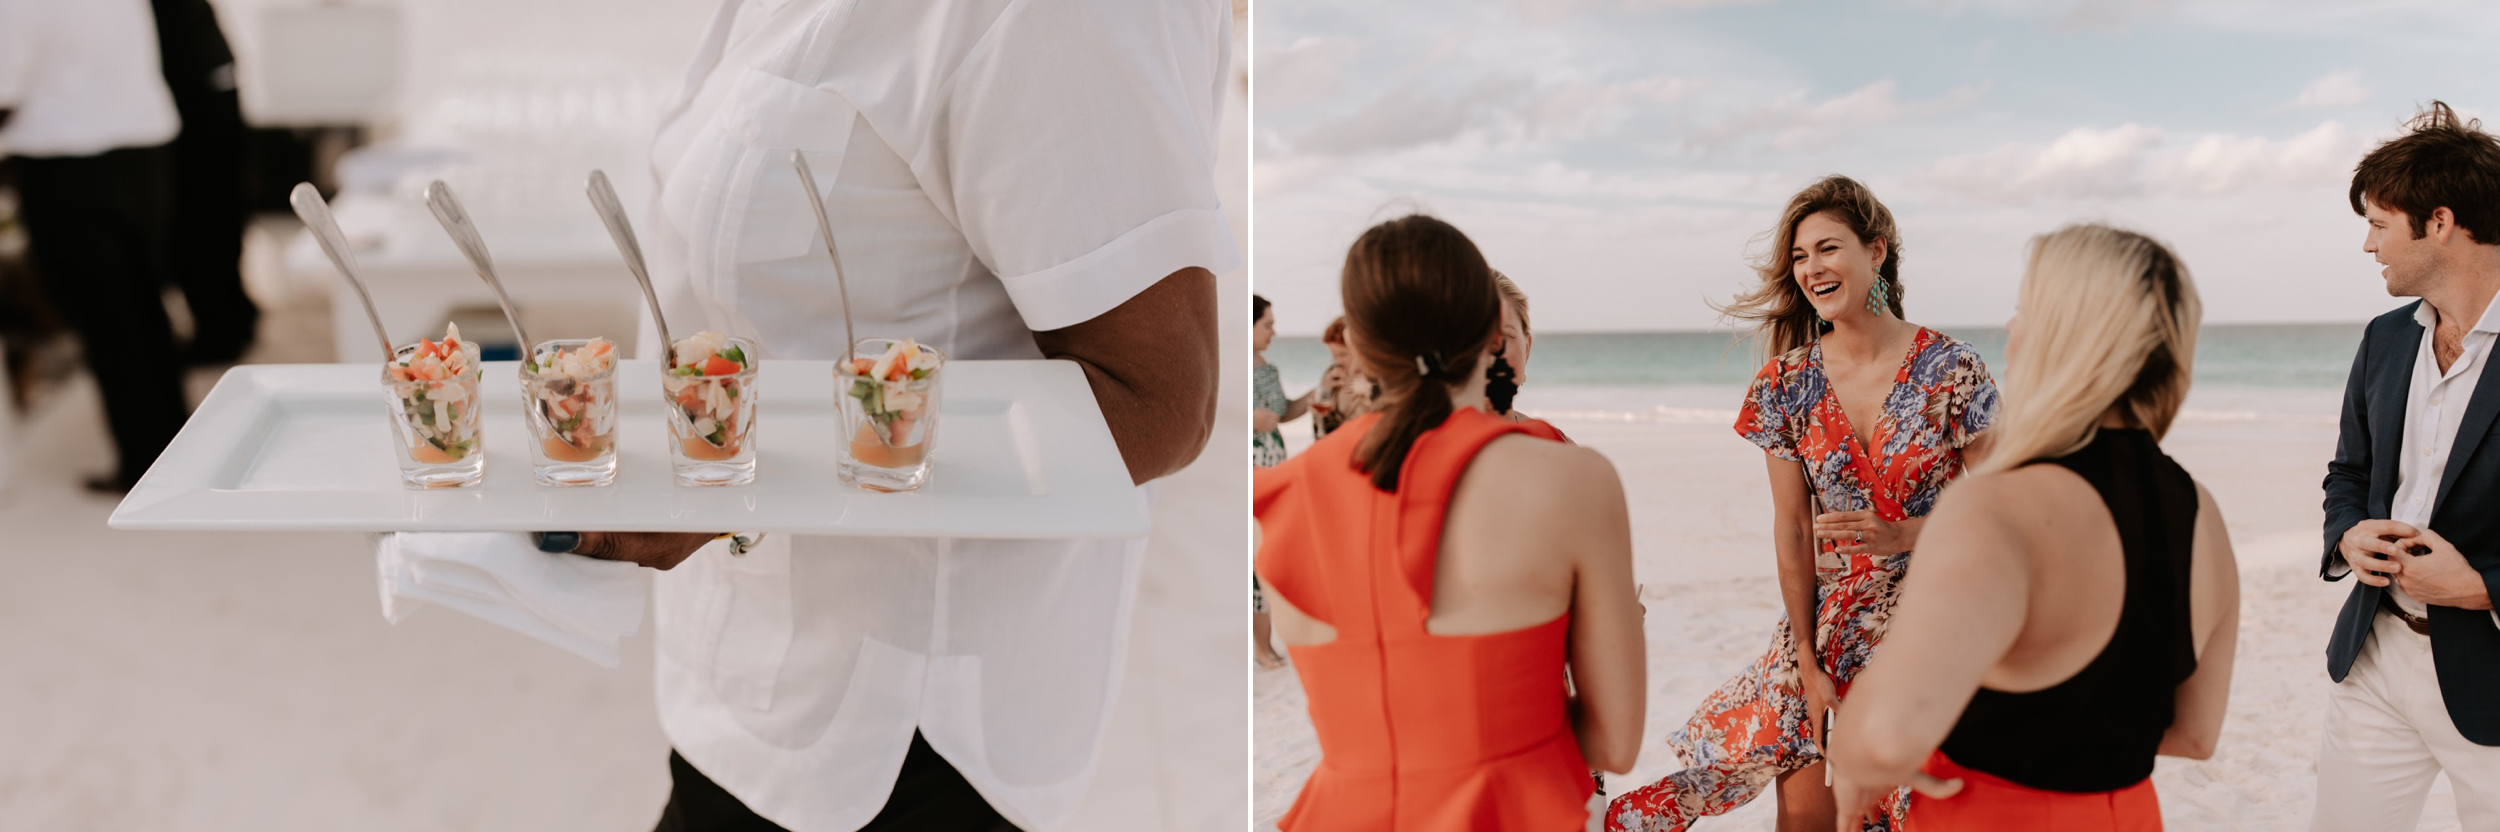 Harbour-Island-Ocean-View-Club-Wedding-Photographer_68.jpg